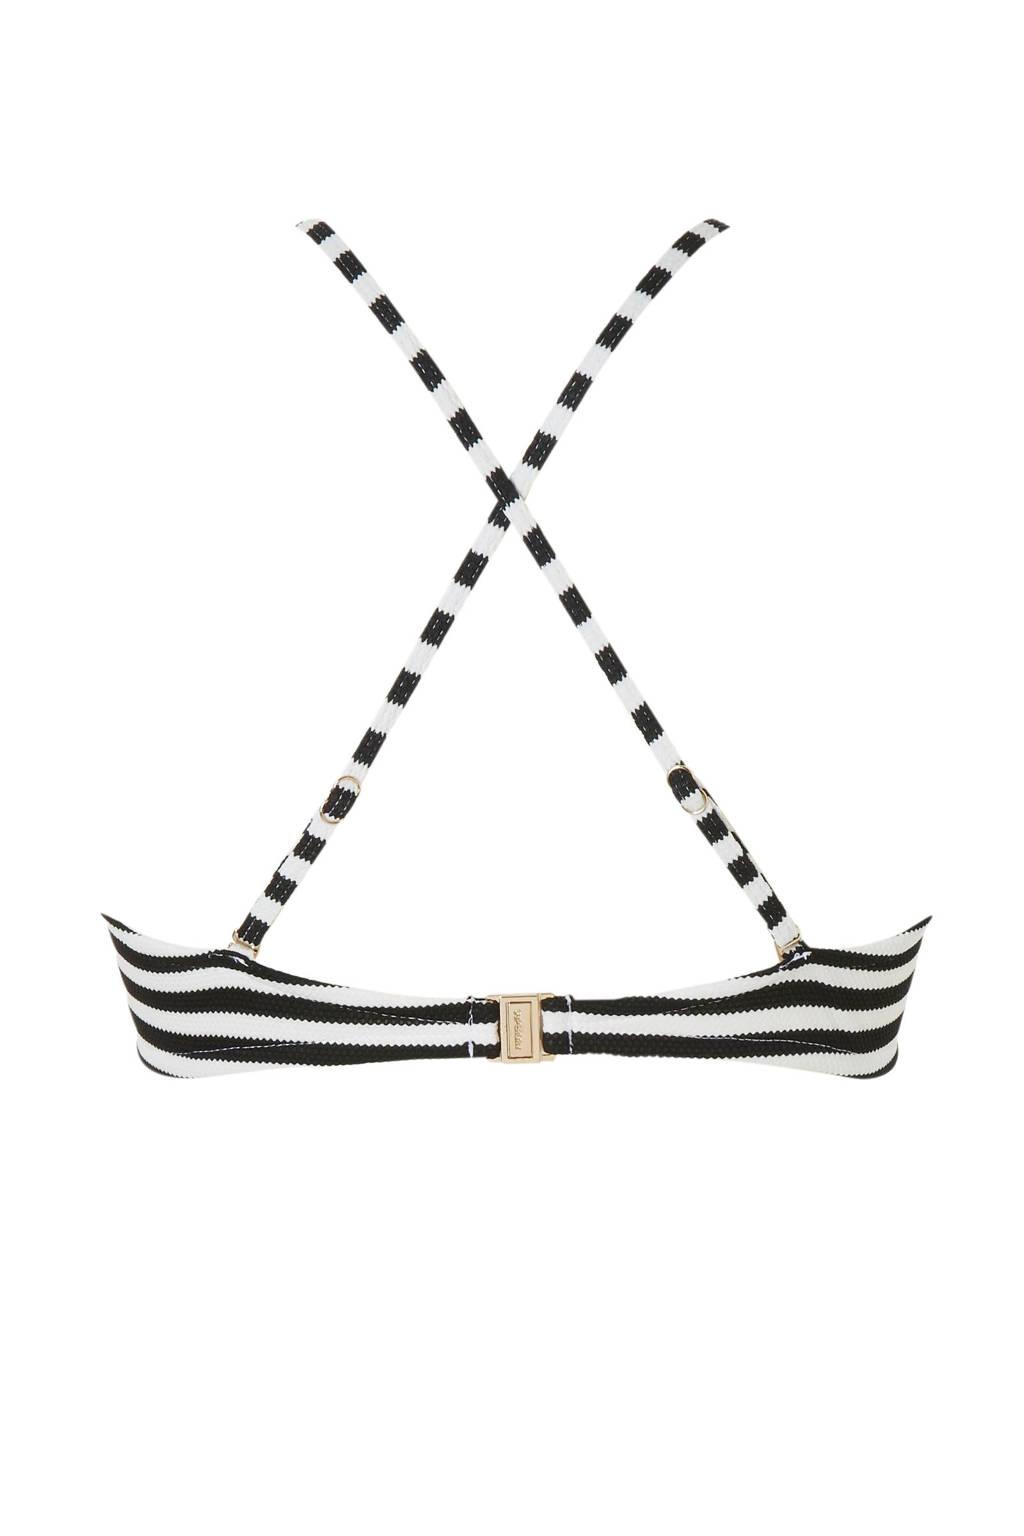 Superdrygestreept Bikinitopje Beugel Zwart Met Textuur xTw6rxU5